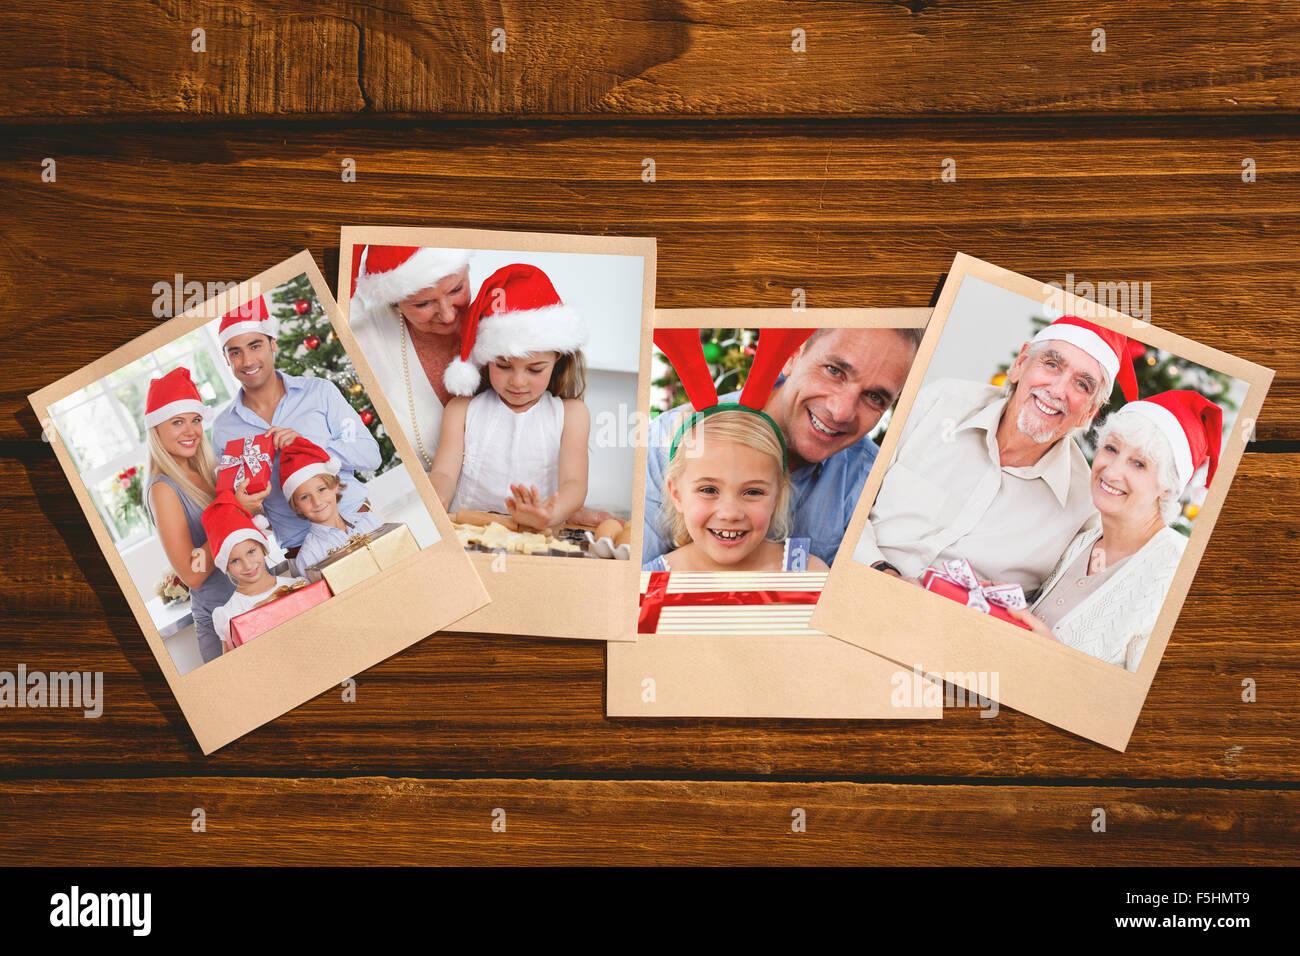 Christmas Gifts For Older Couples | Christmas 2018